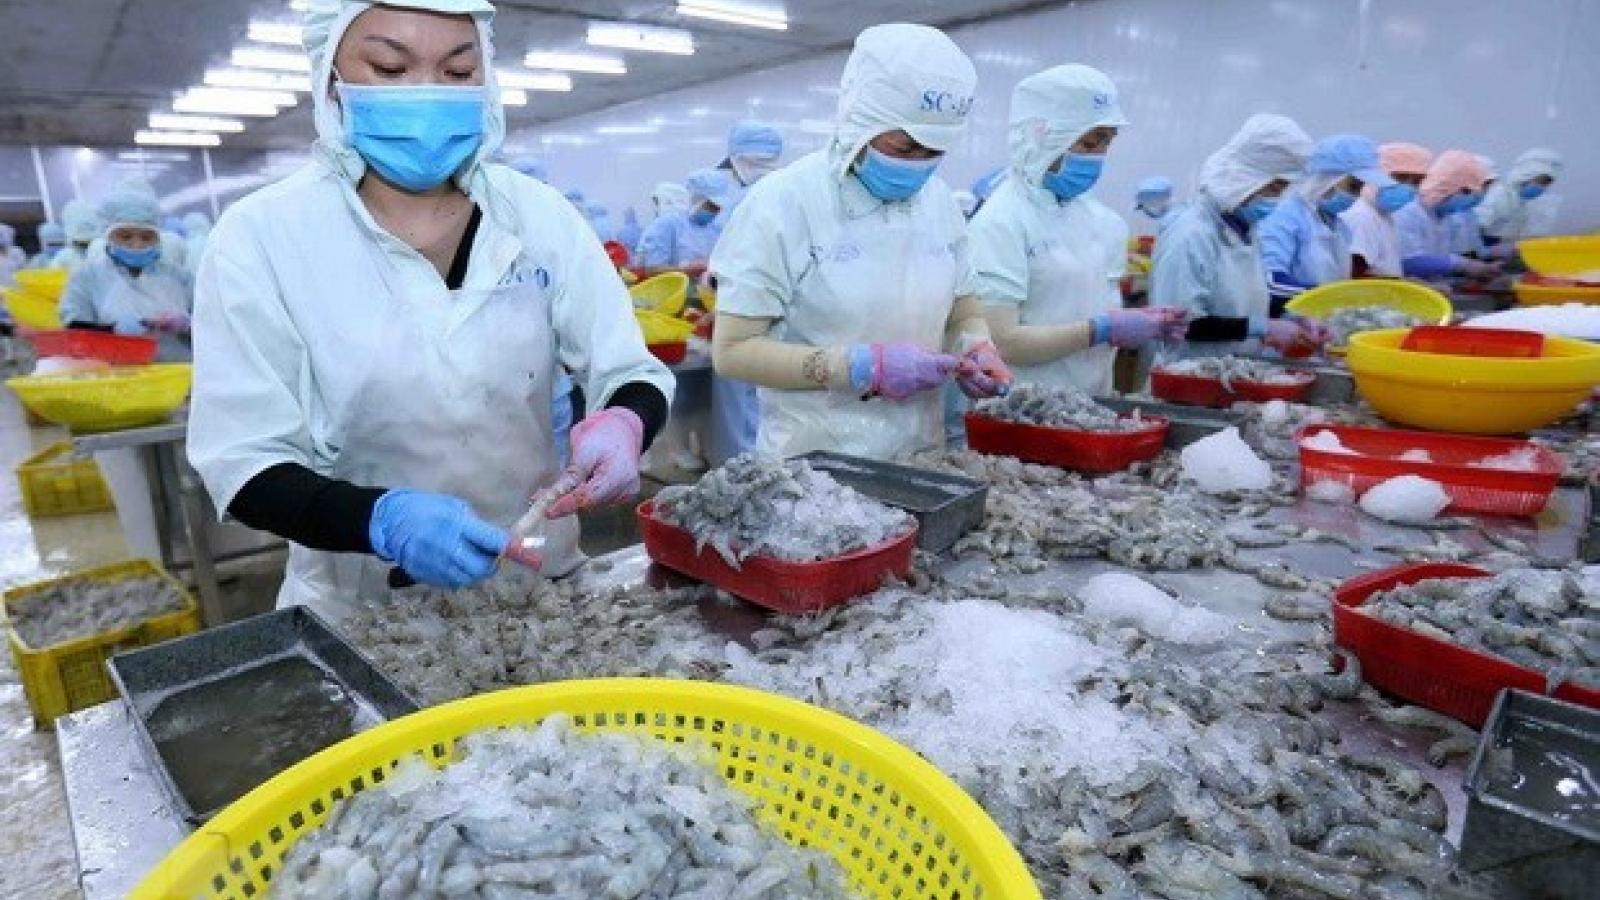 Aquatic exports to China plunge amid COVID-19 threats